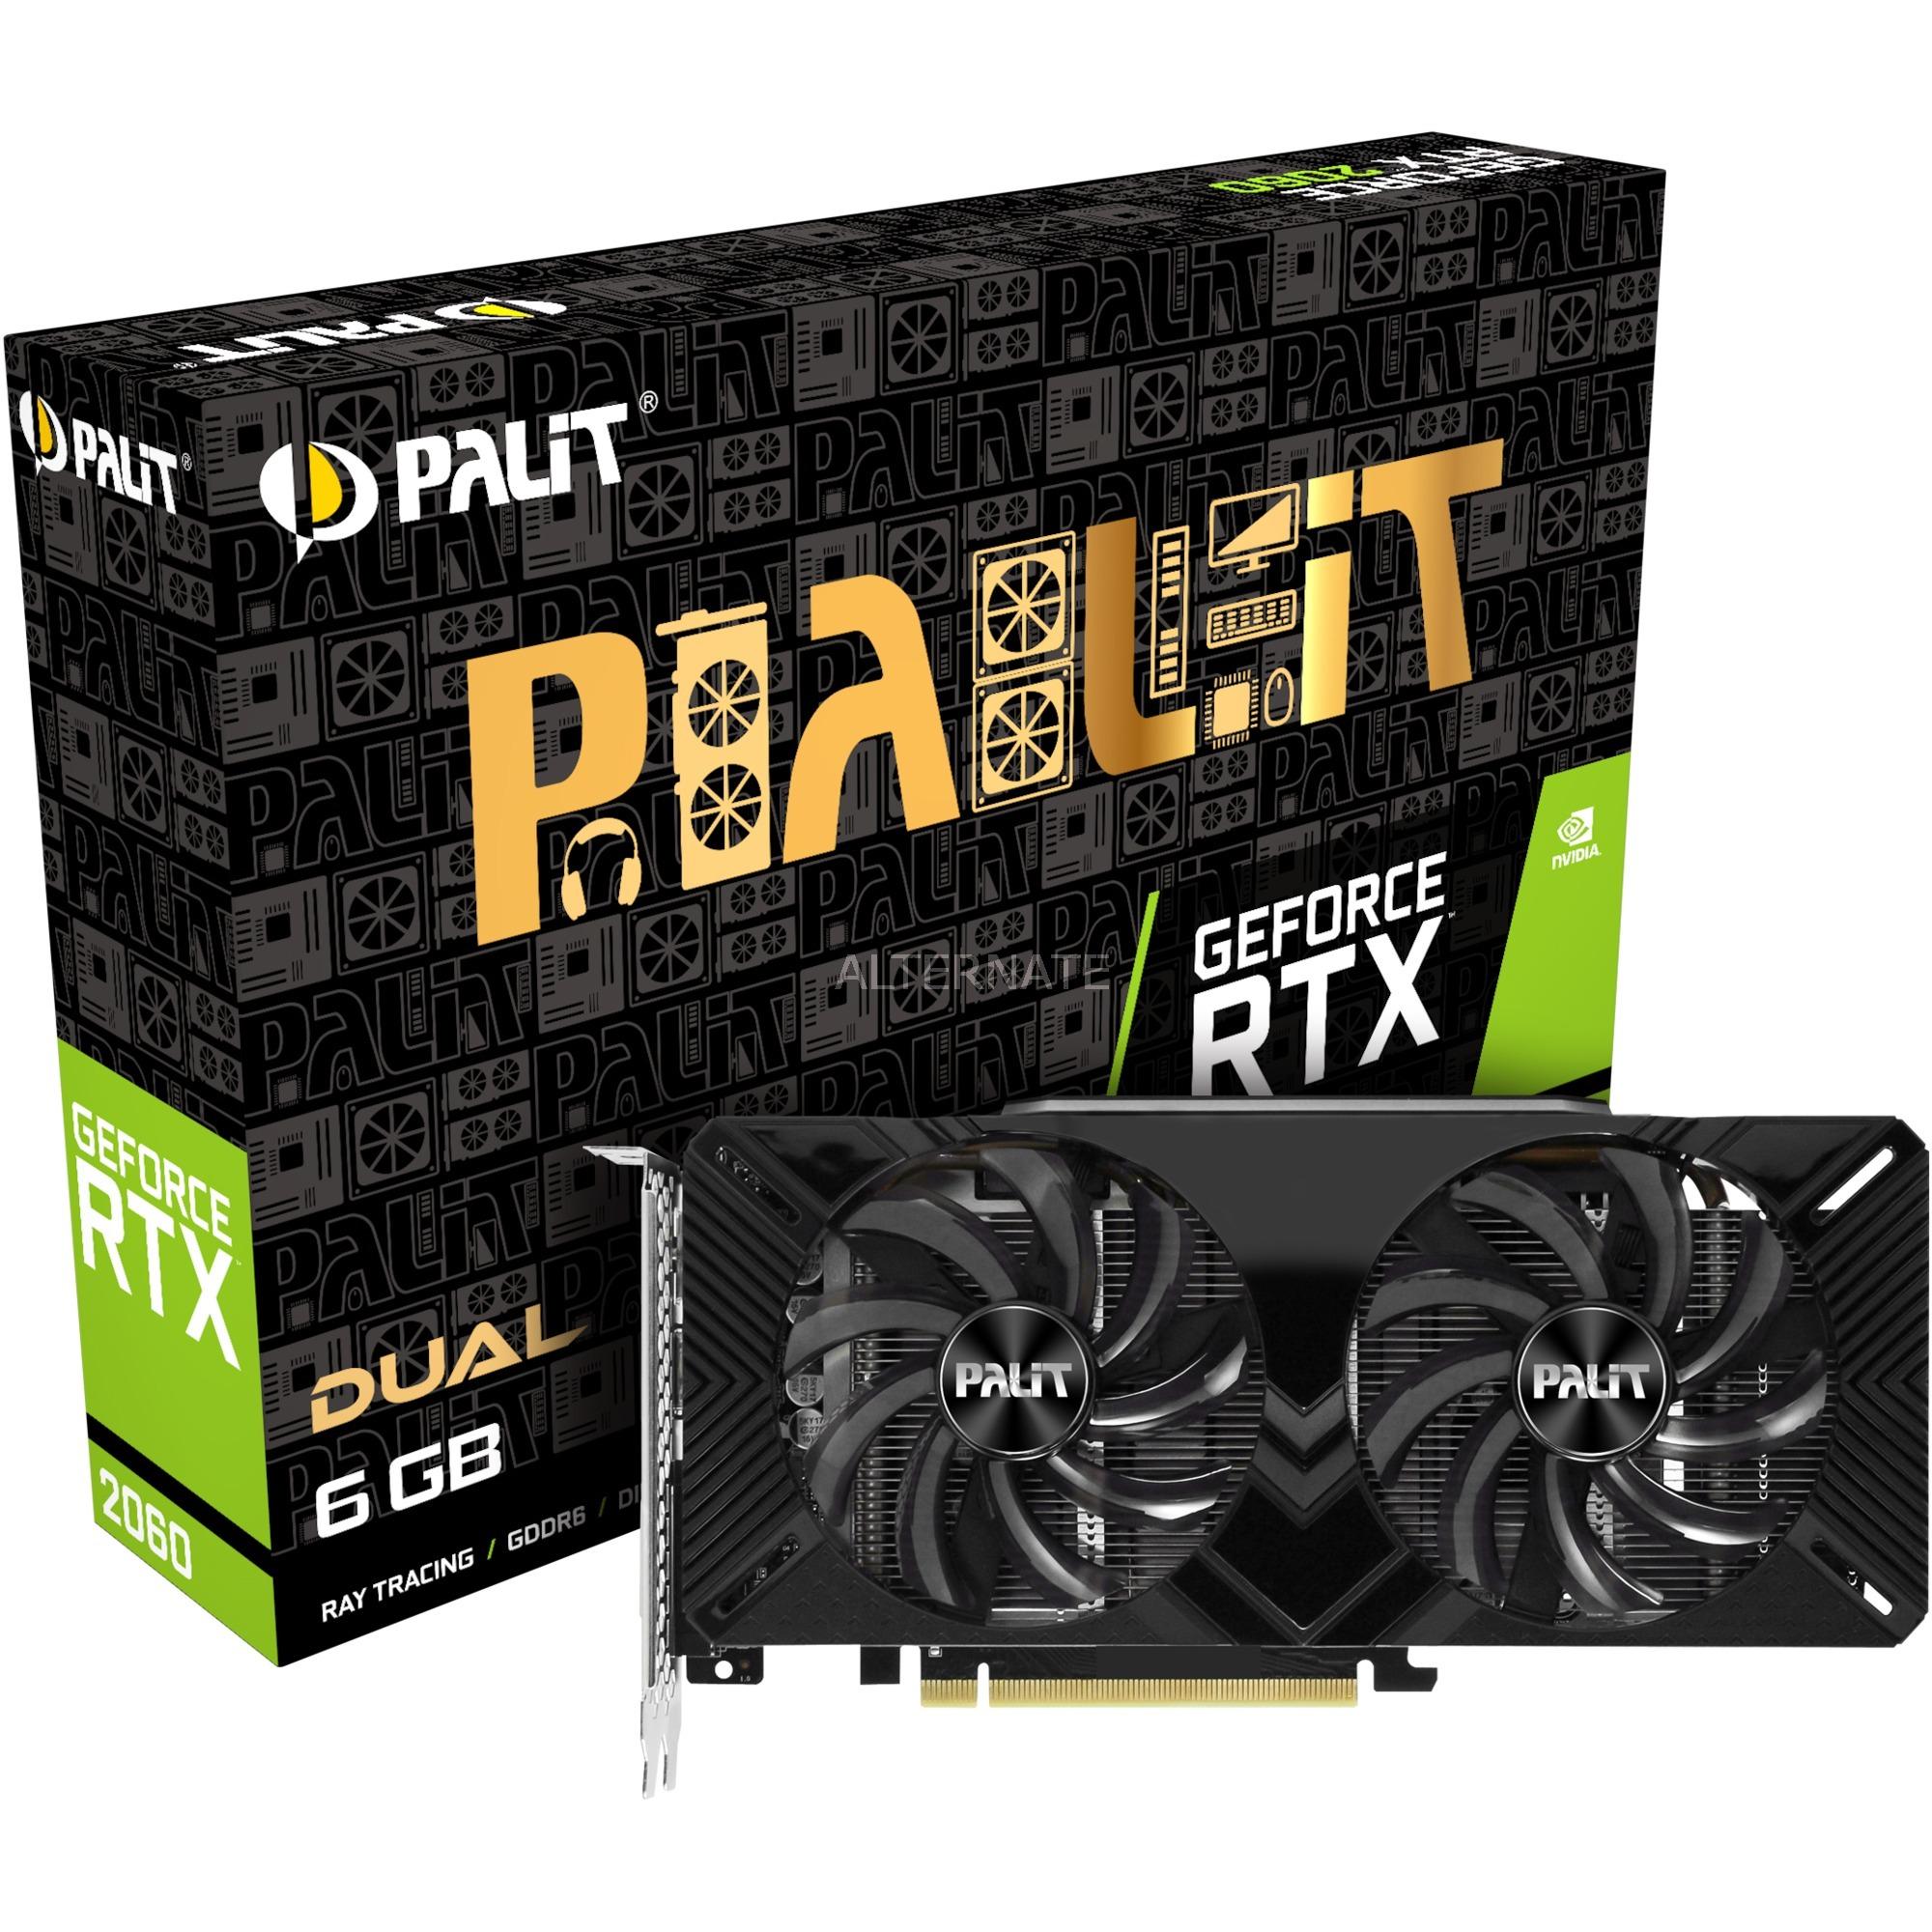 GeForce RTX 2060 Dual, Tarjeta gráfica